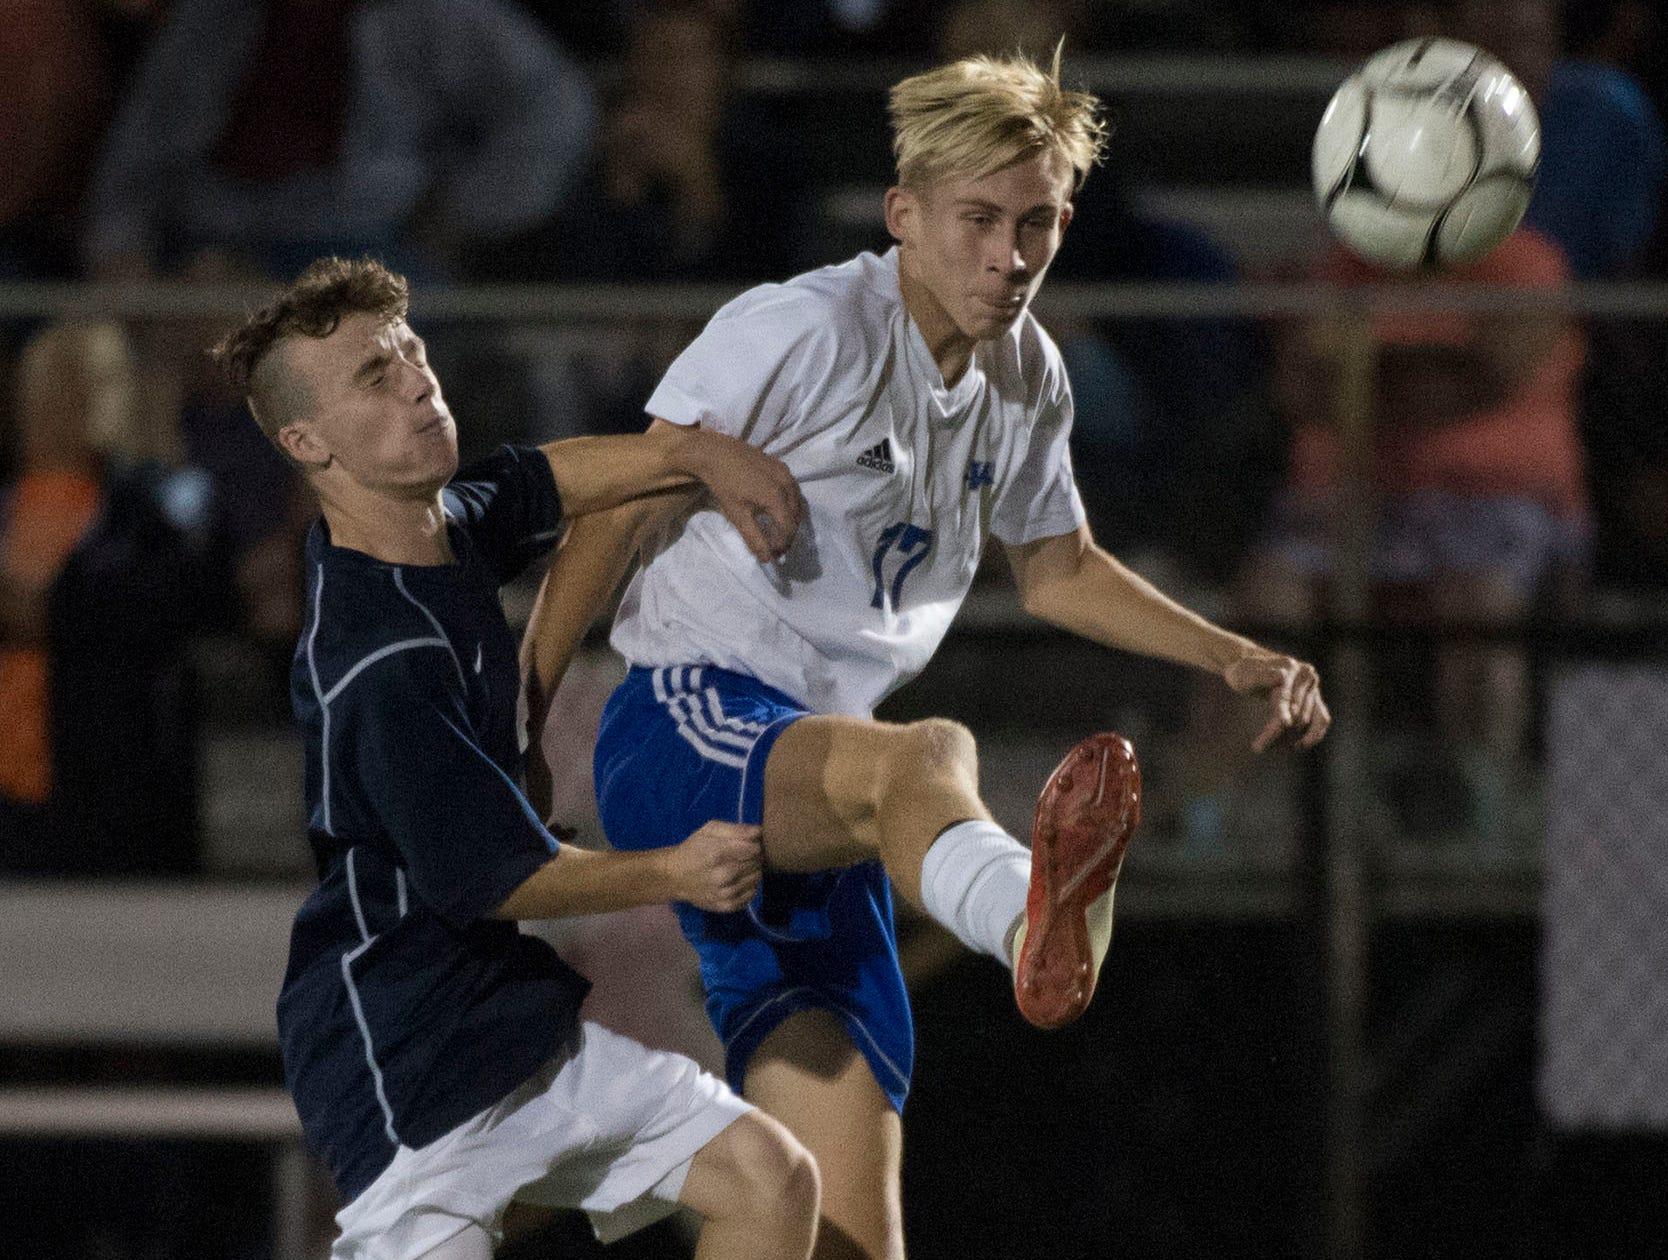 Waynesboro's Tyler Hanosek, right, kicks the ball away from Greencastle's Tanner Martin. Waynesboro shocked Greencastle with a 4-0 shutout in PIAA Mid-Colonial soccer on Tuesday, Oct. 9, 2018.